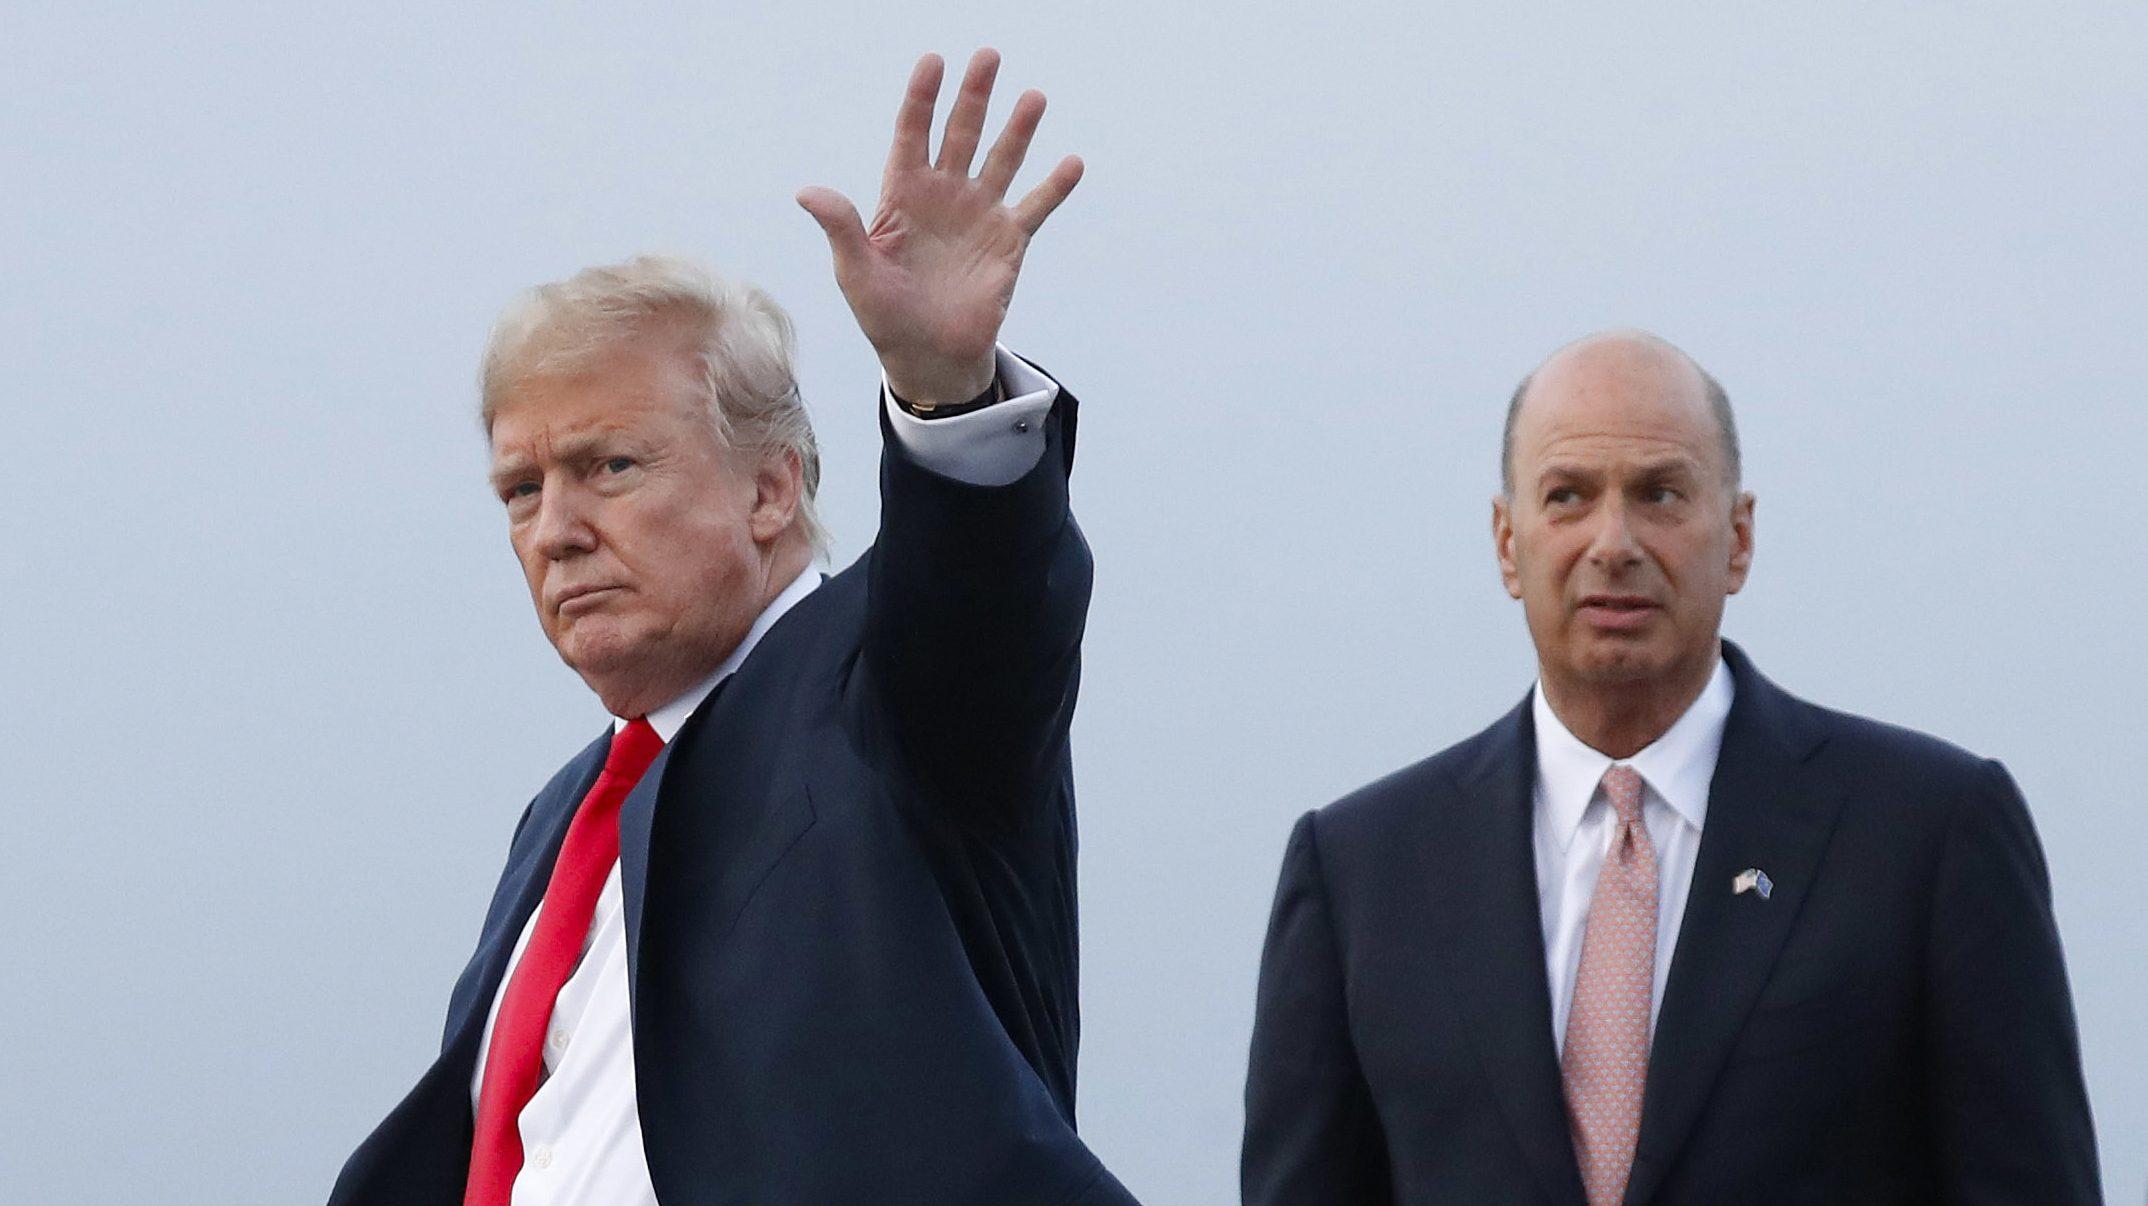 Trump waves as Sondland watches